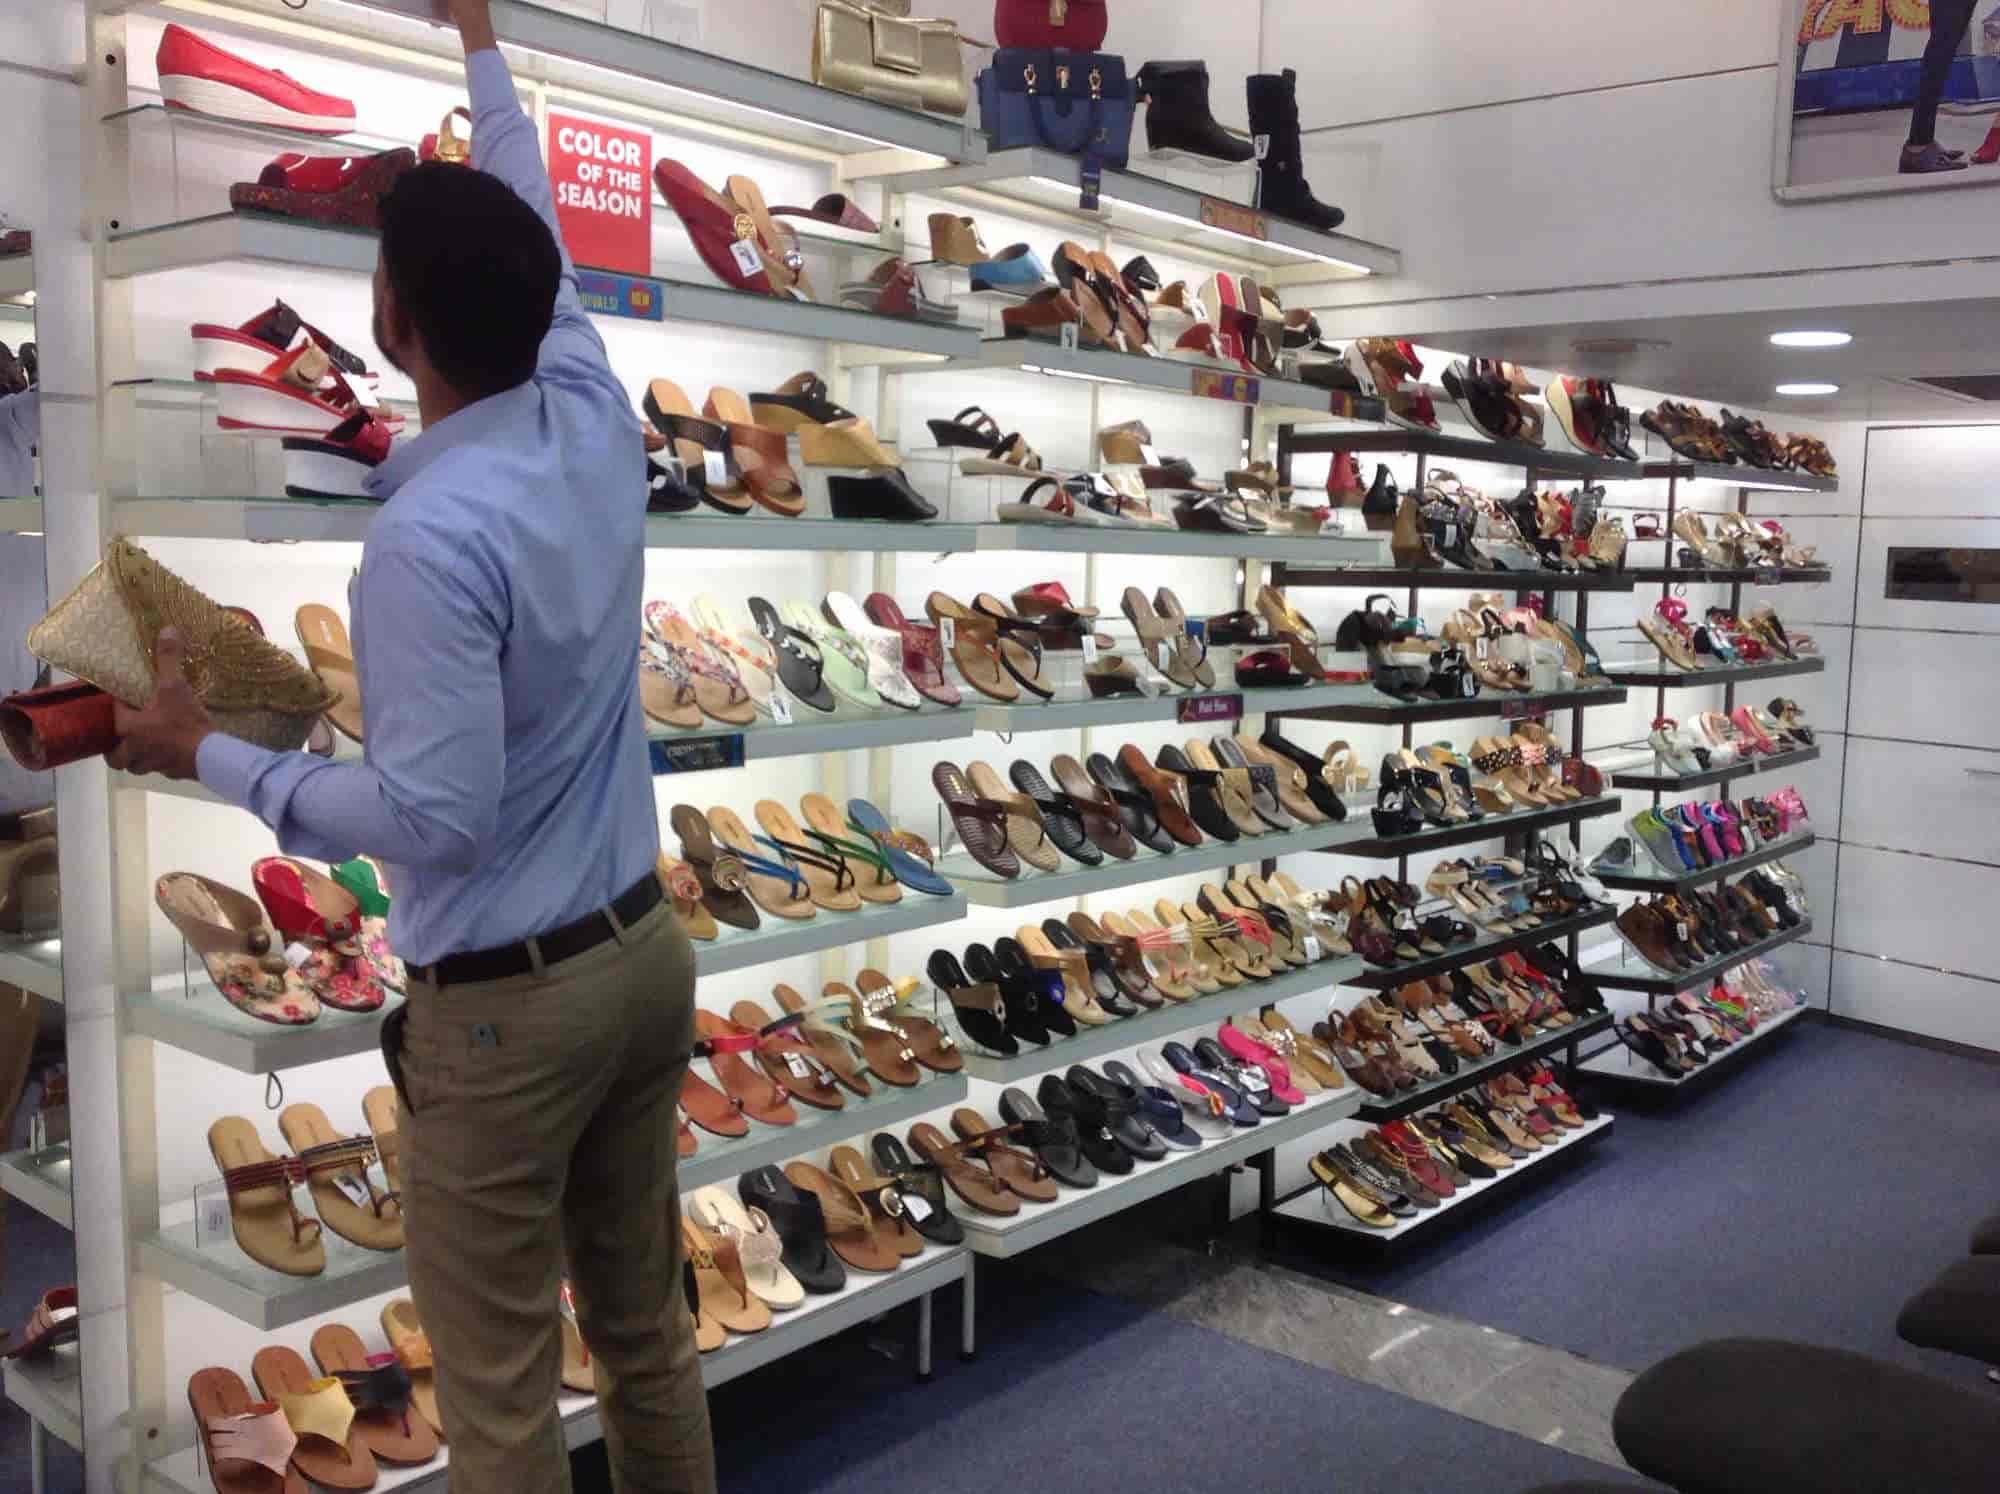 de1f6083882 ... Mochi The Shoe Shoppe Photos